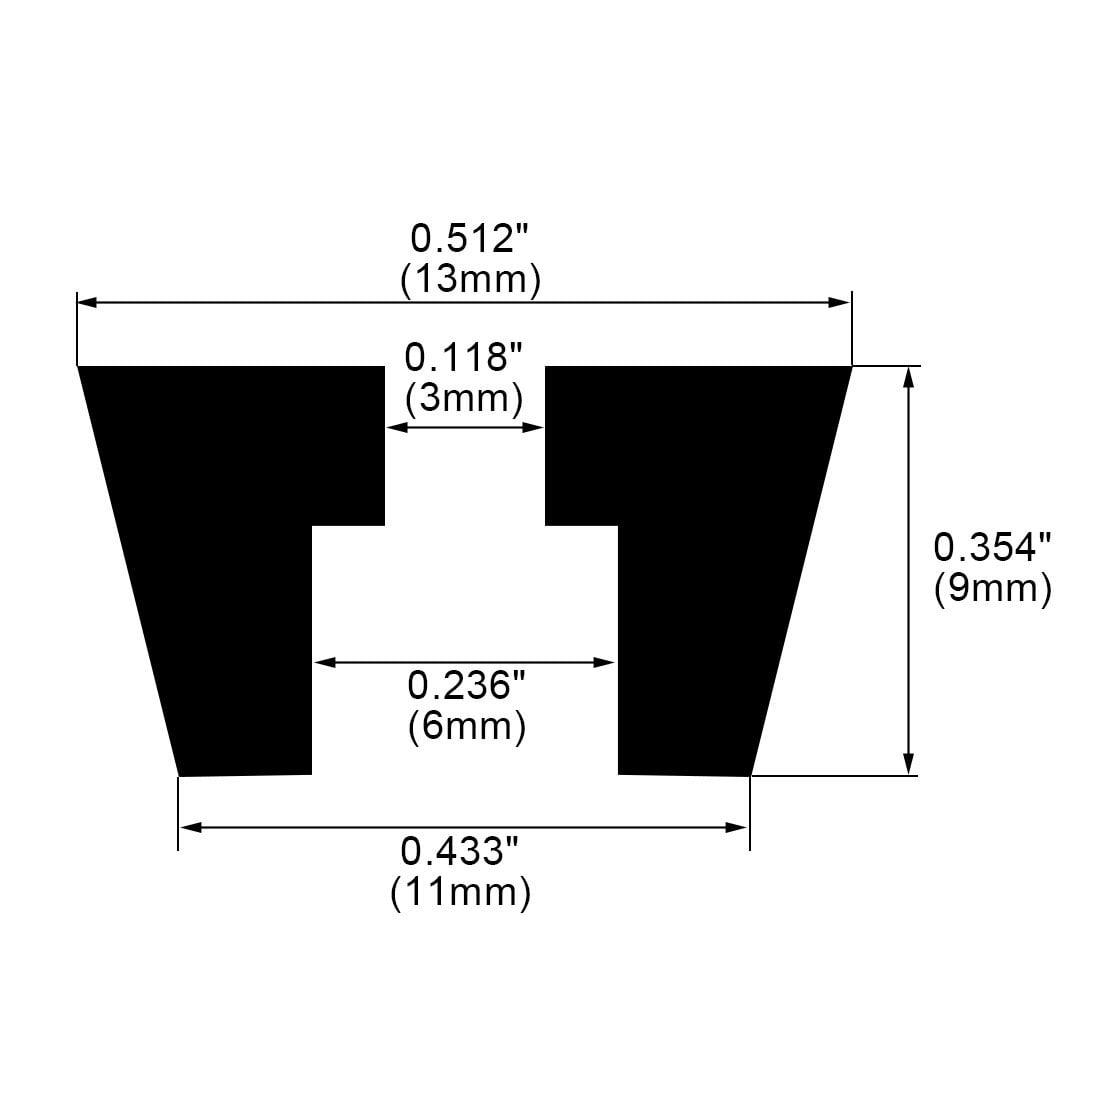 12pcs Rubber Feet Bumper Printer Chopping Board Speaker Leg Pads, D13x11xH9mm - image 1 de 7